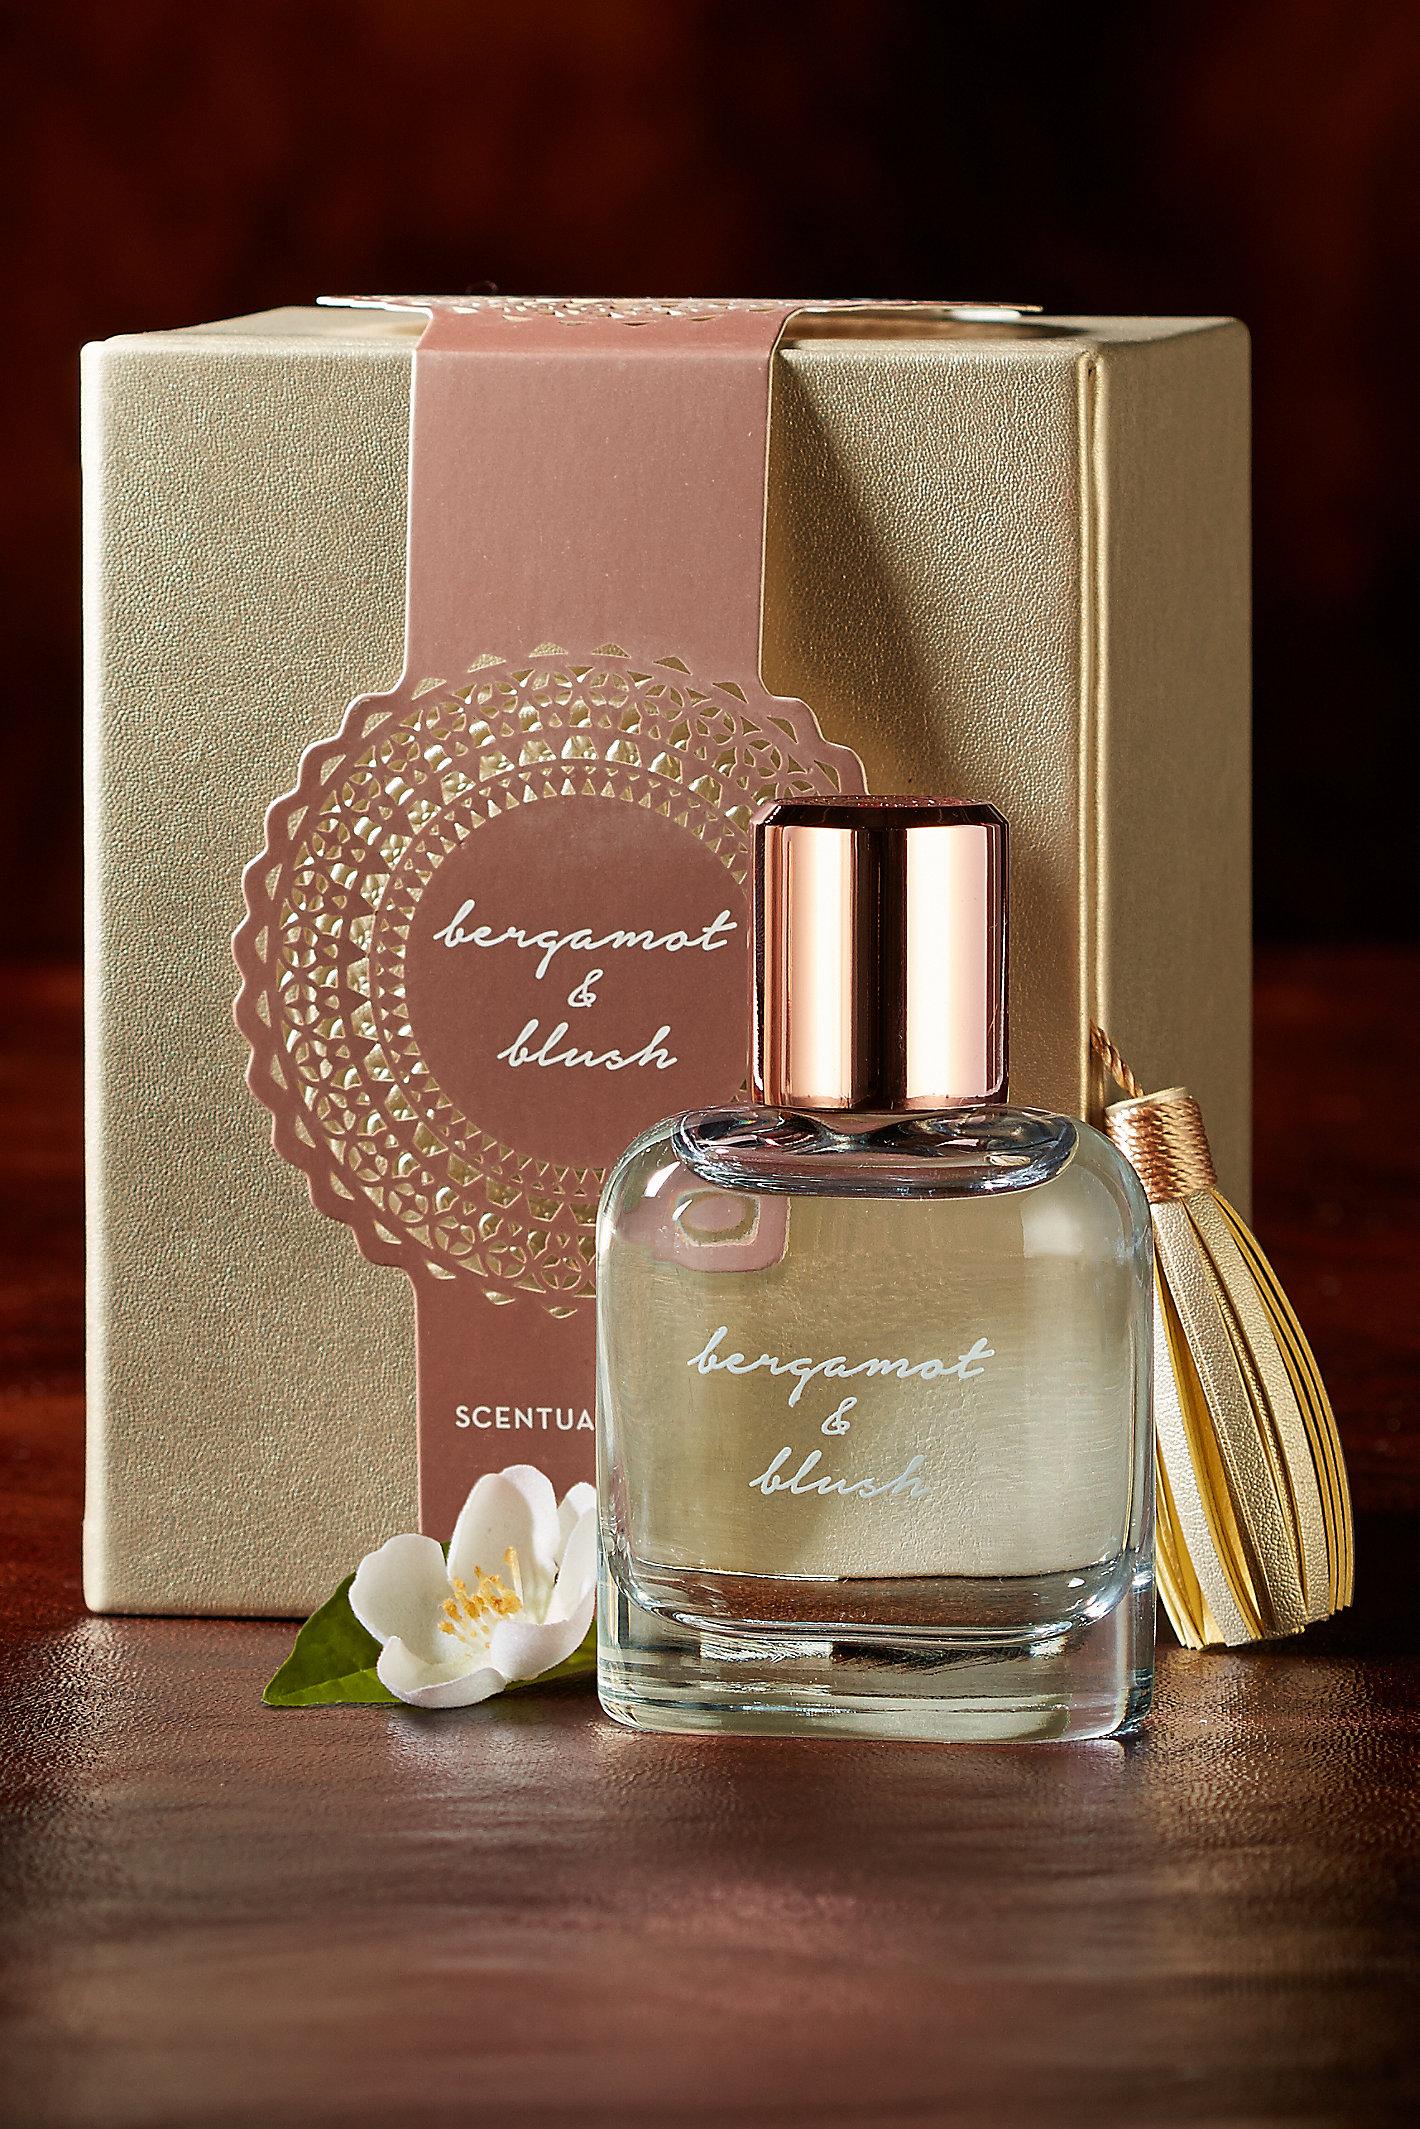 Scentual Suedes Bergamot&blush